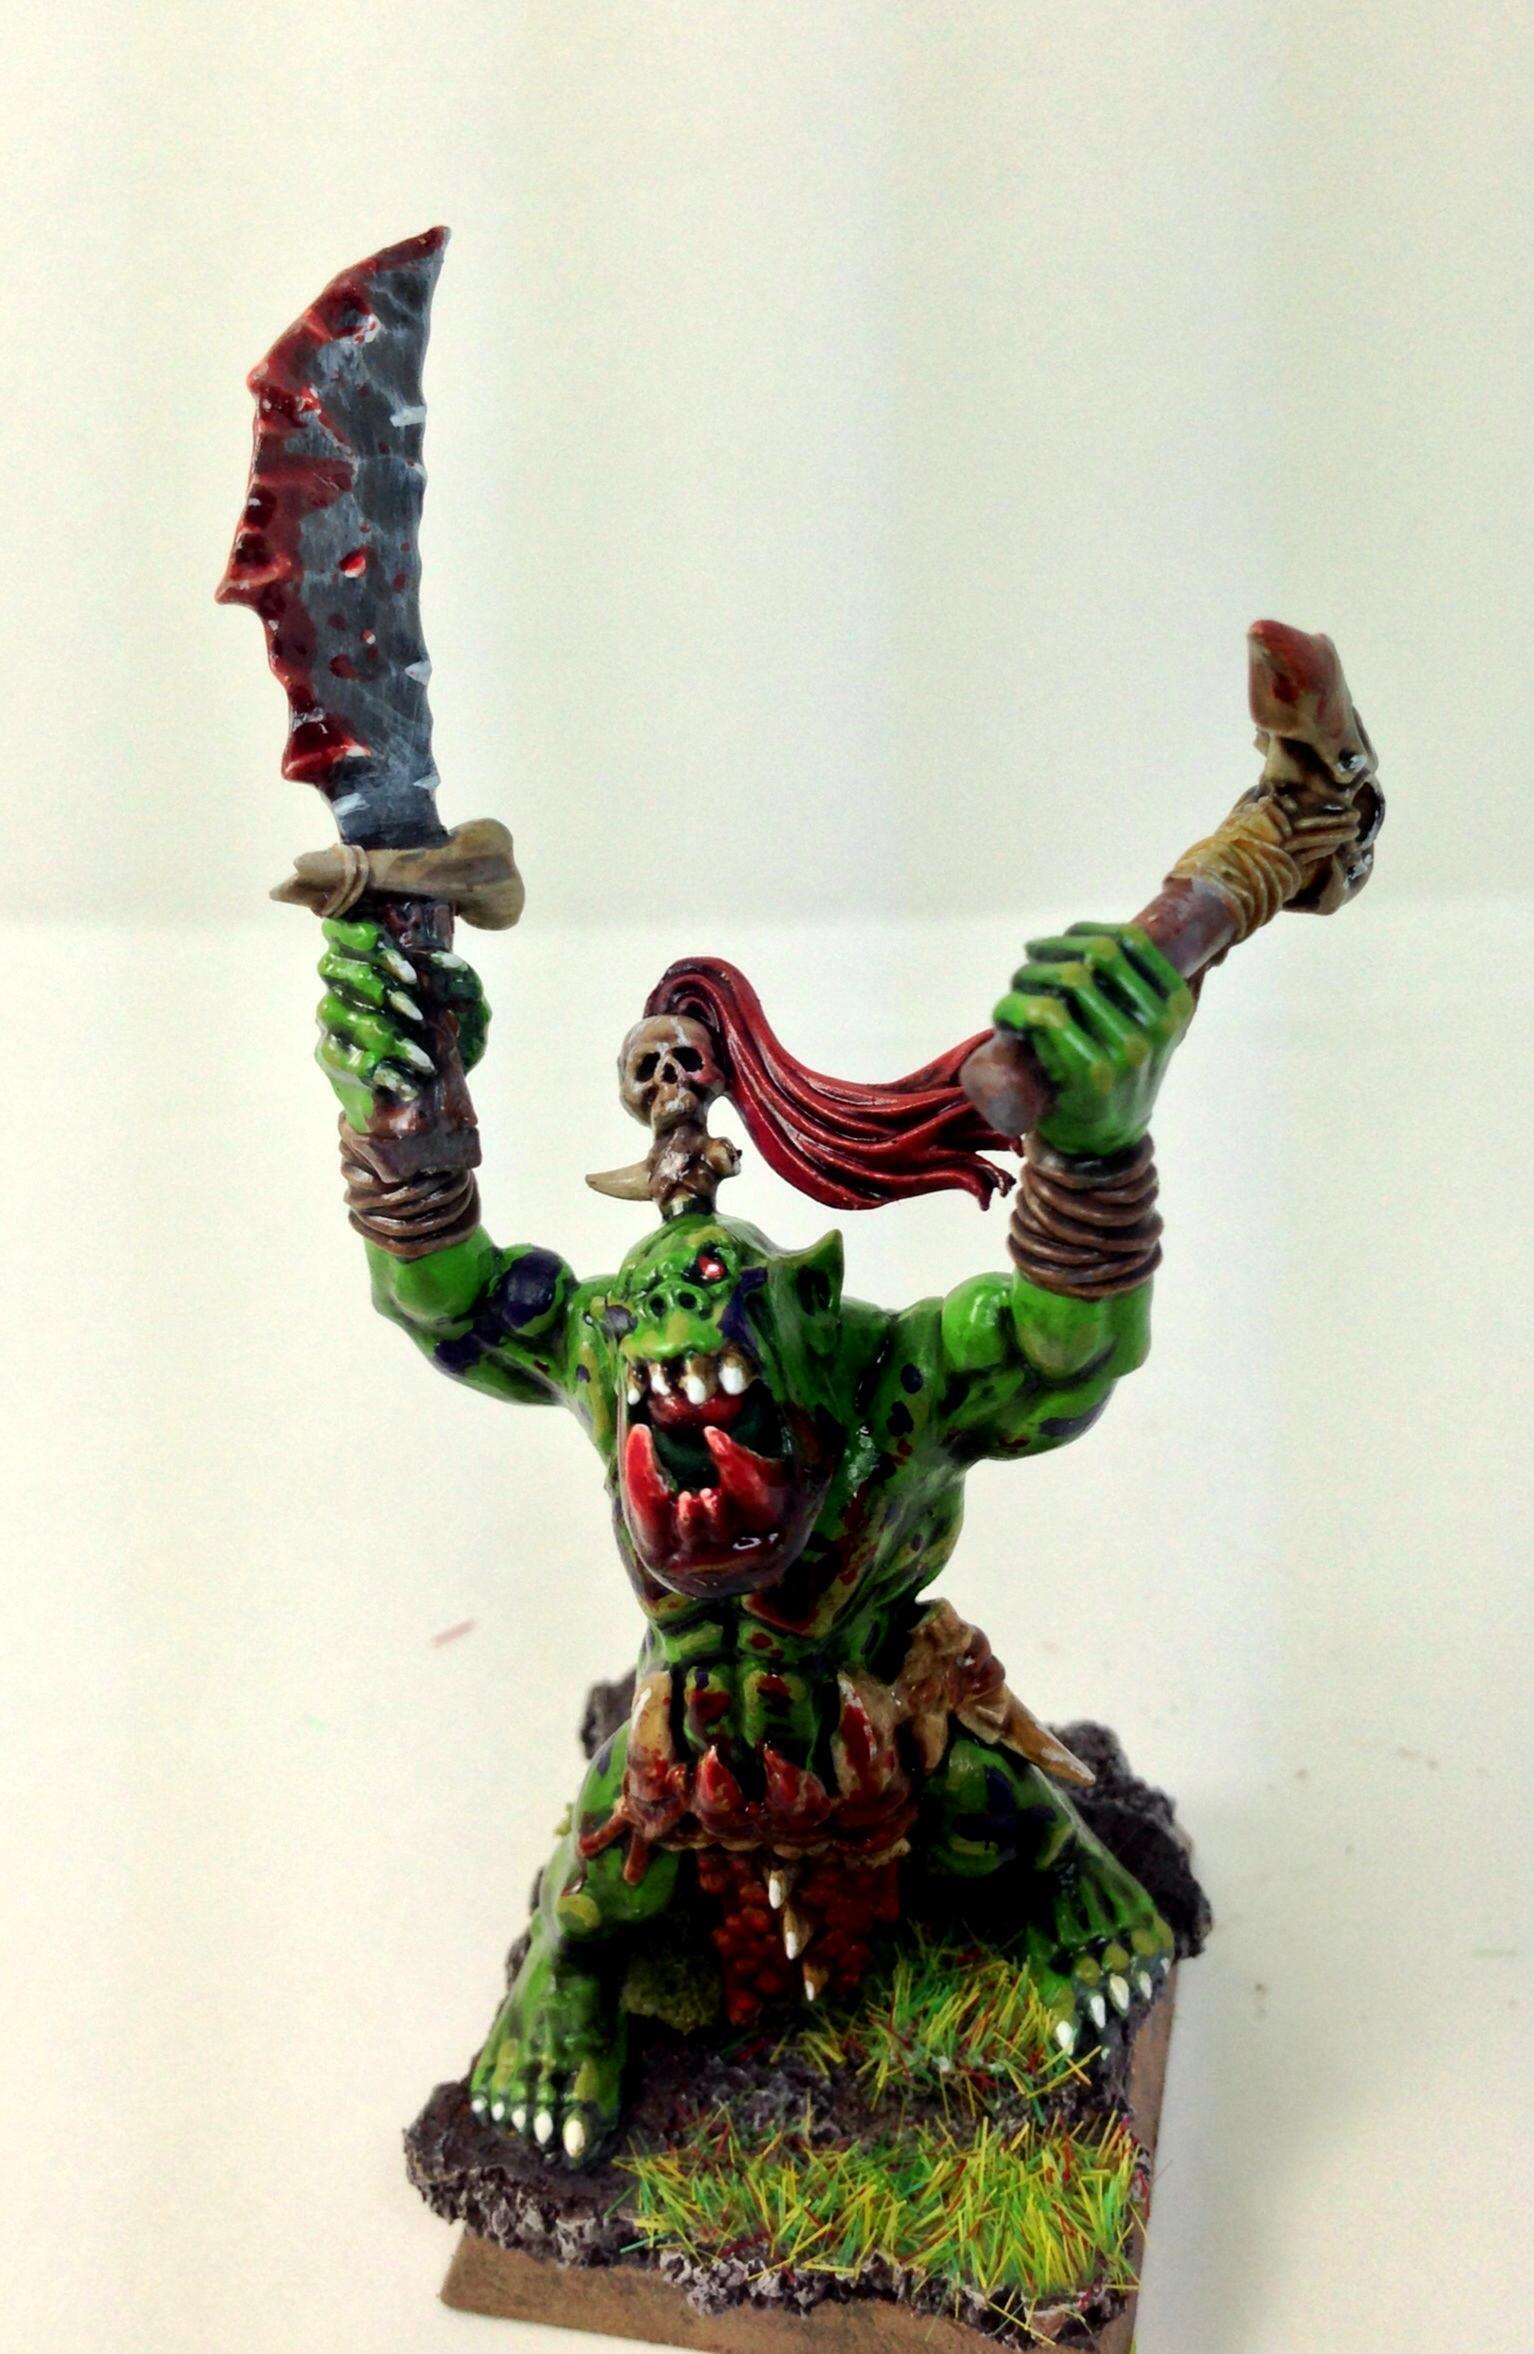 Goblins, Orcs, Orcs & Goblins, Orcs And Goblins, Savage Orc, So, Warhammer Fantasy